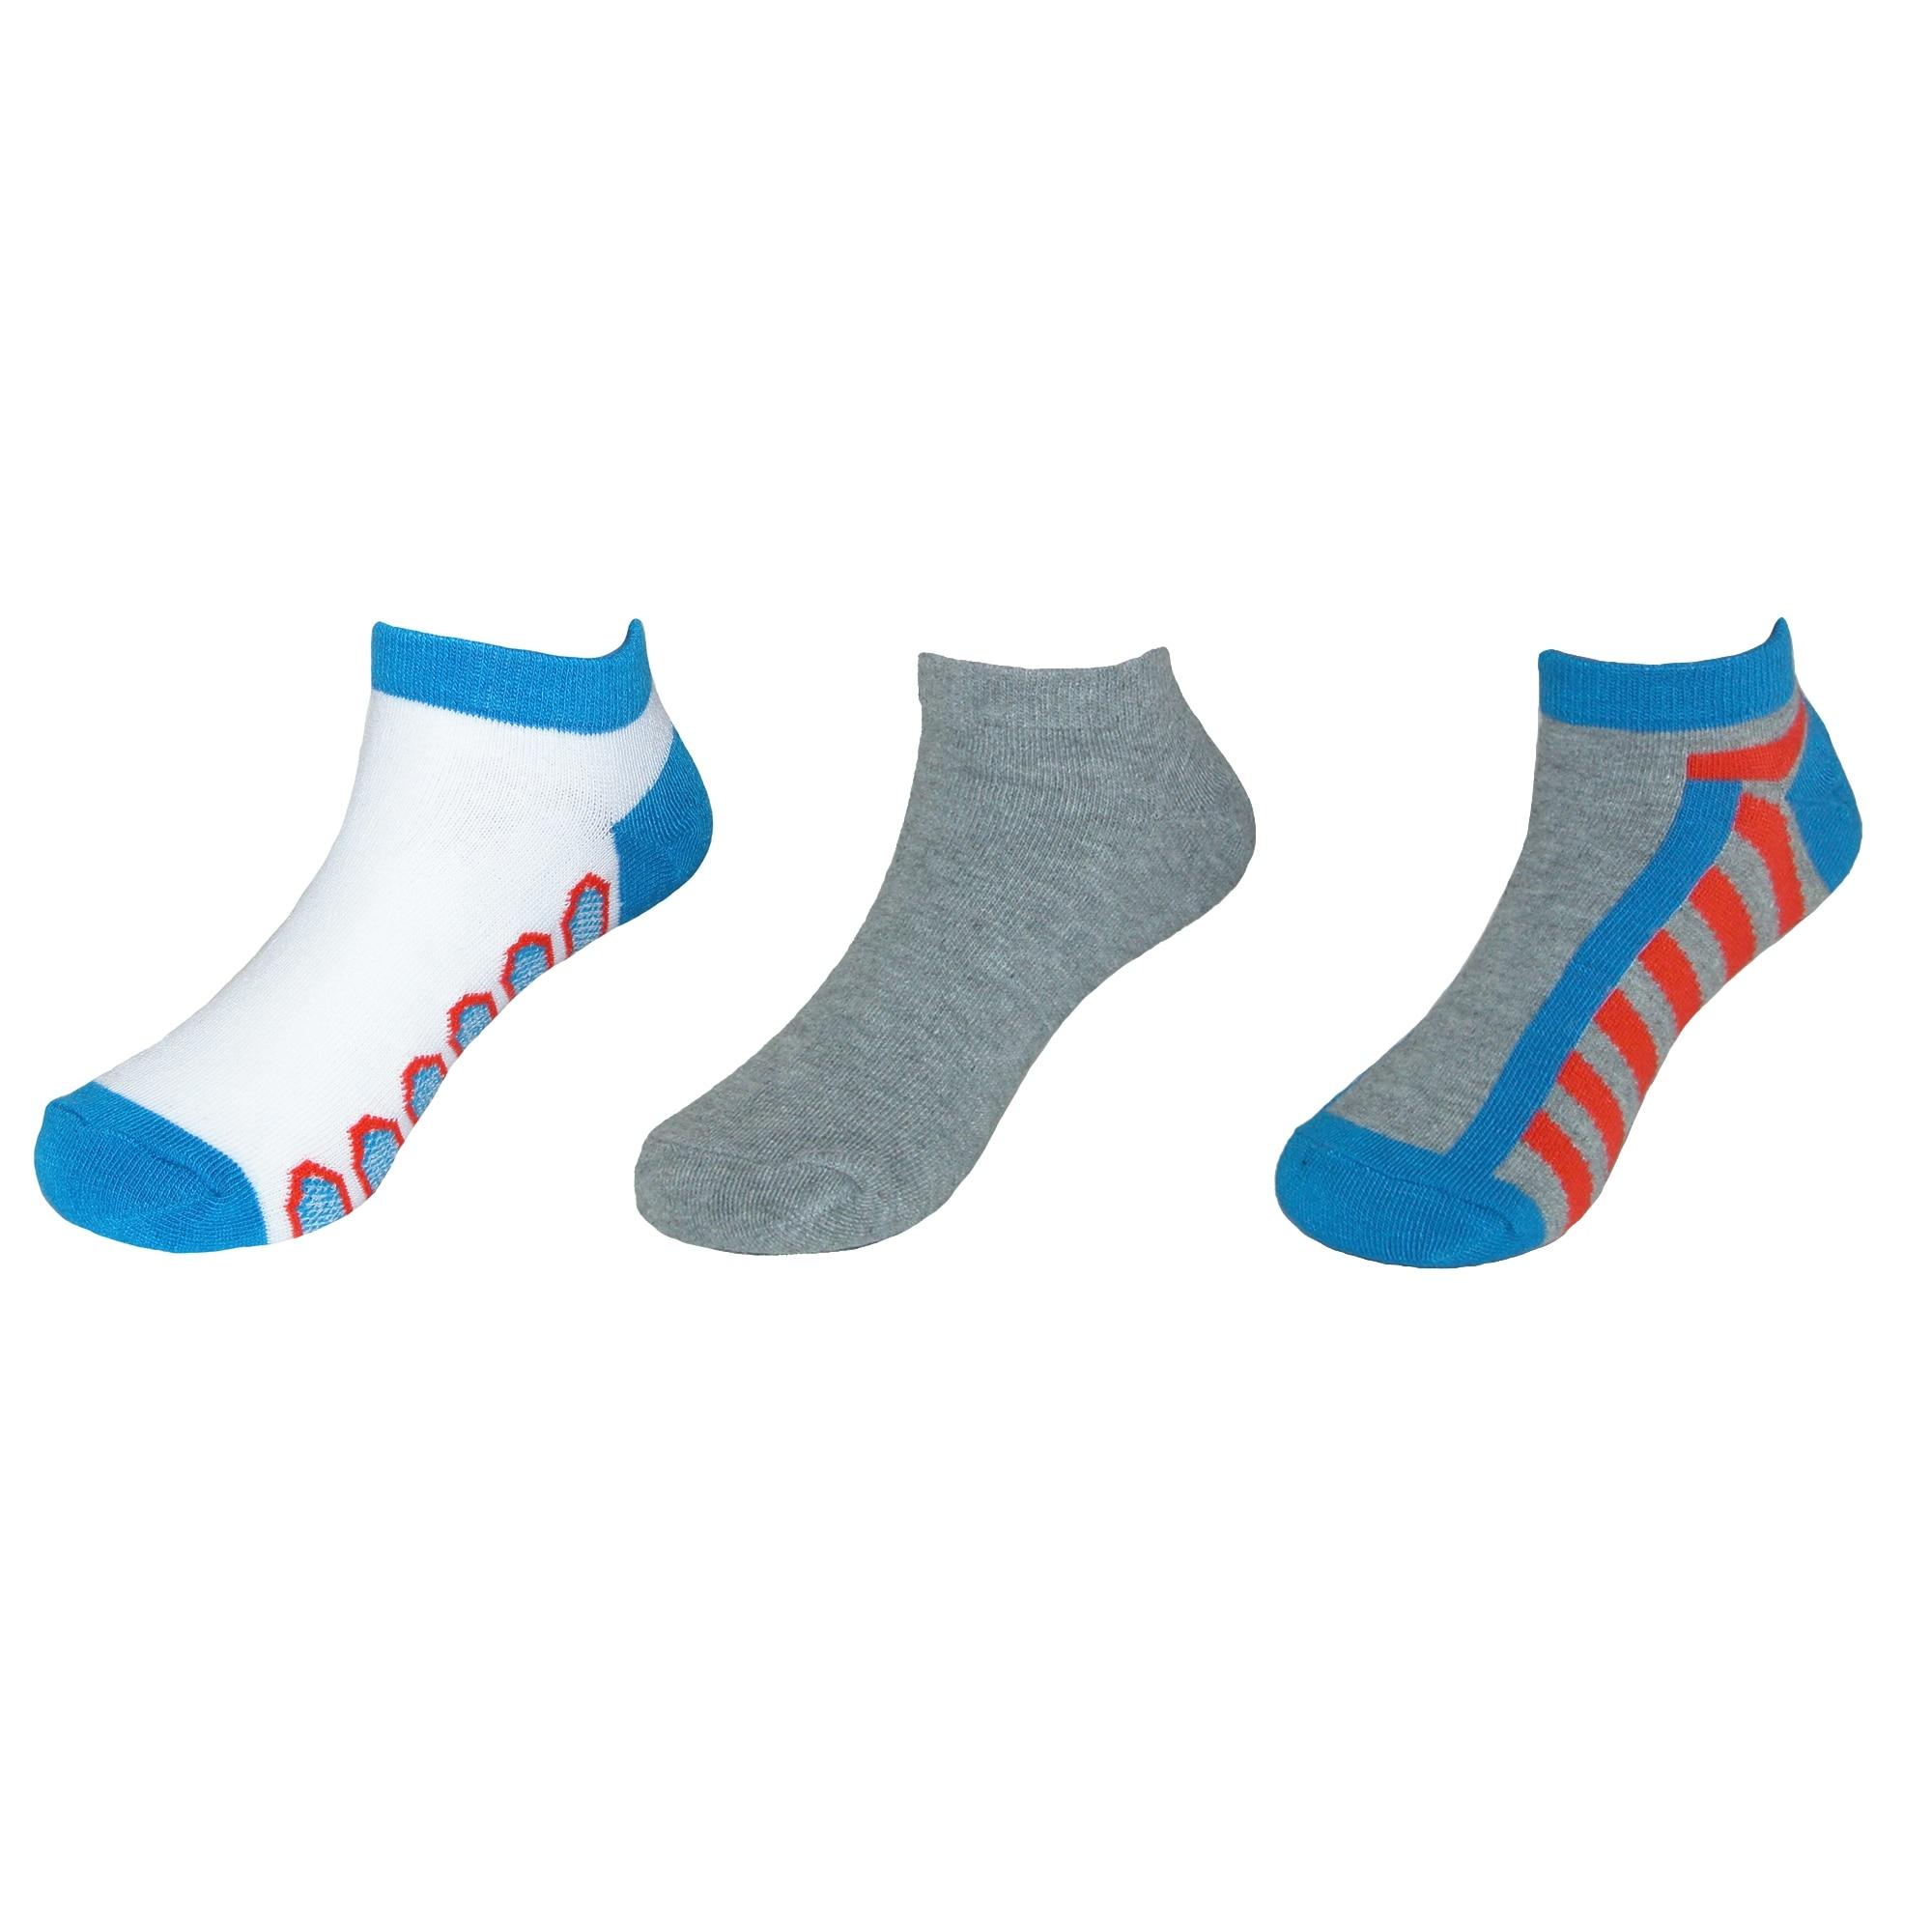 71d43b0128 Beverly Hills Polo Club Boy's Low Cut Athletic Socks (3 Pair Pack)